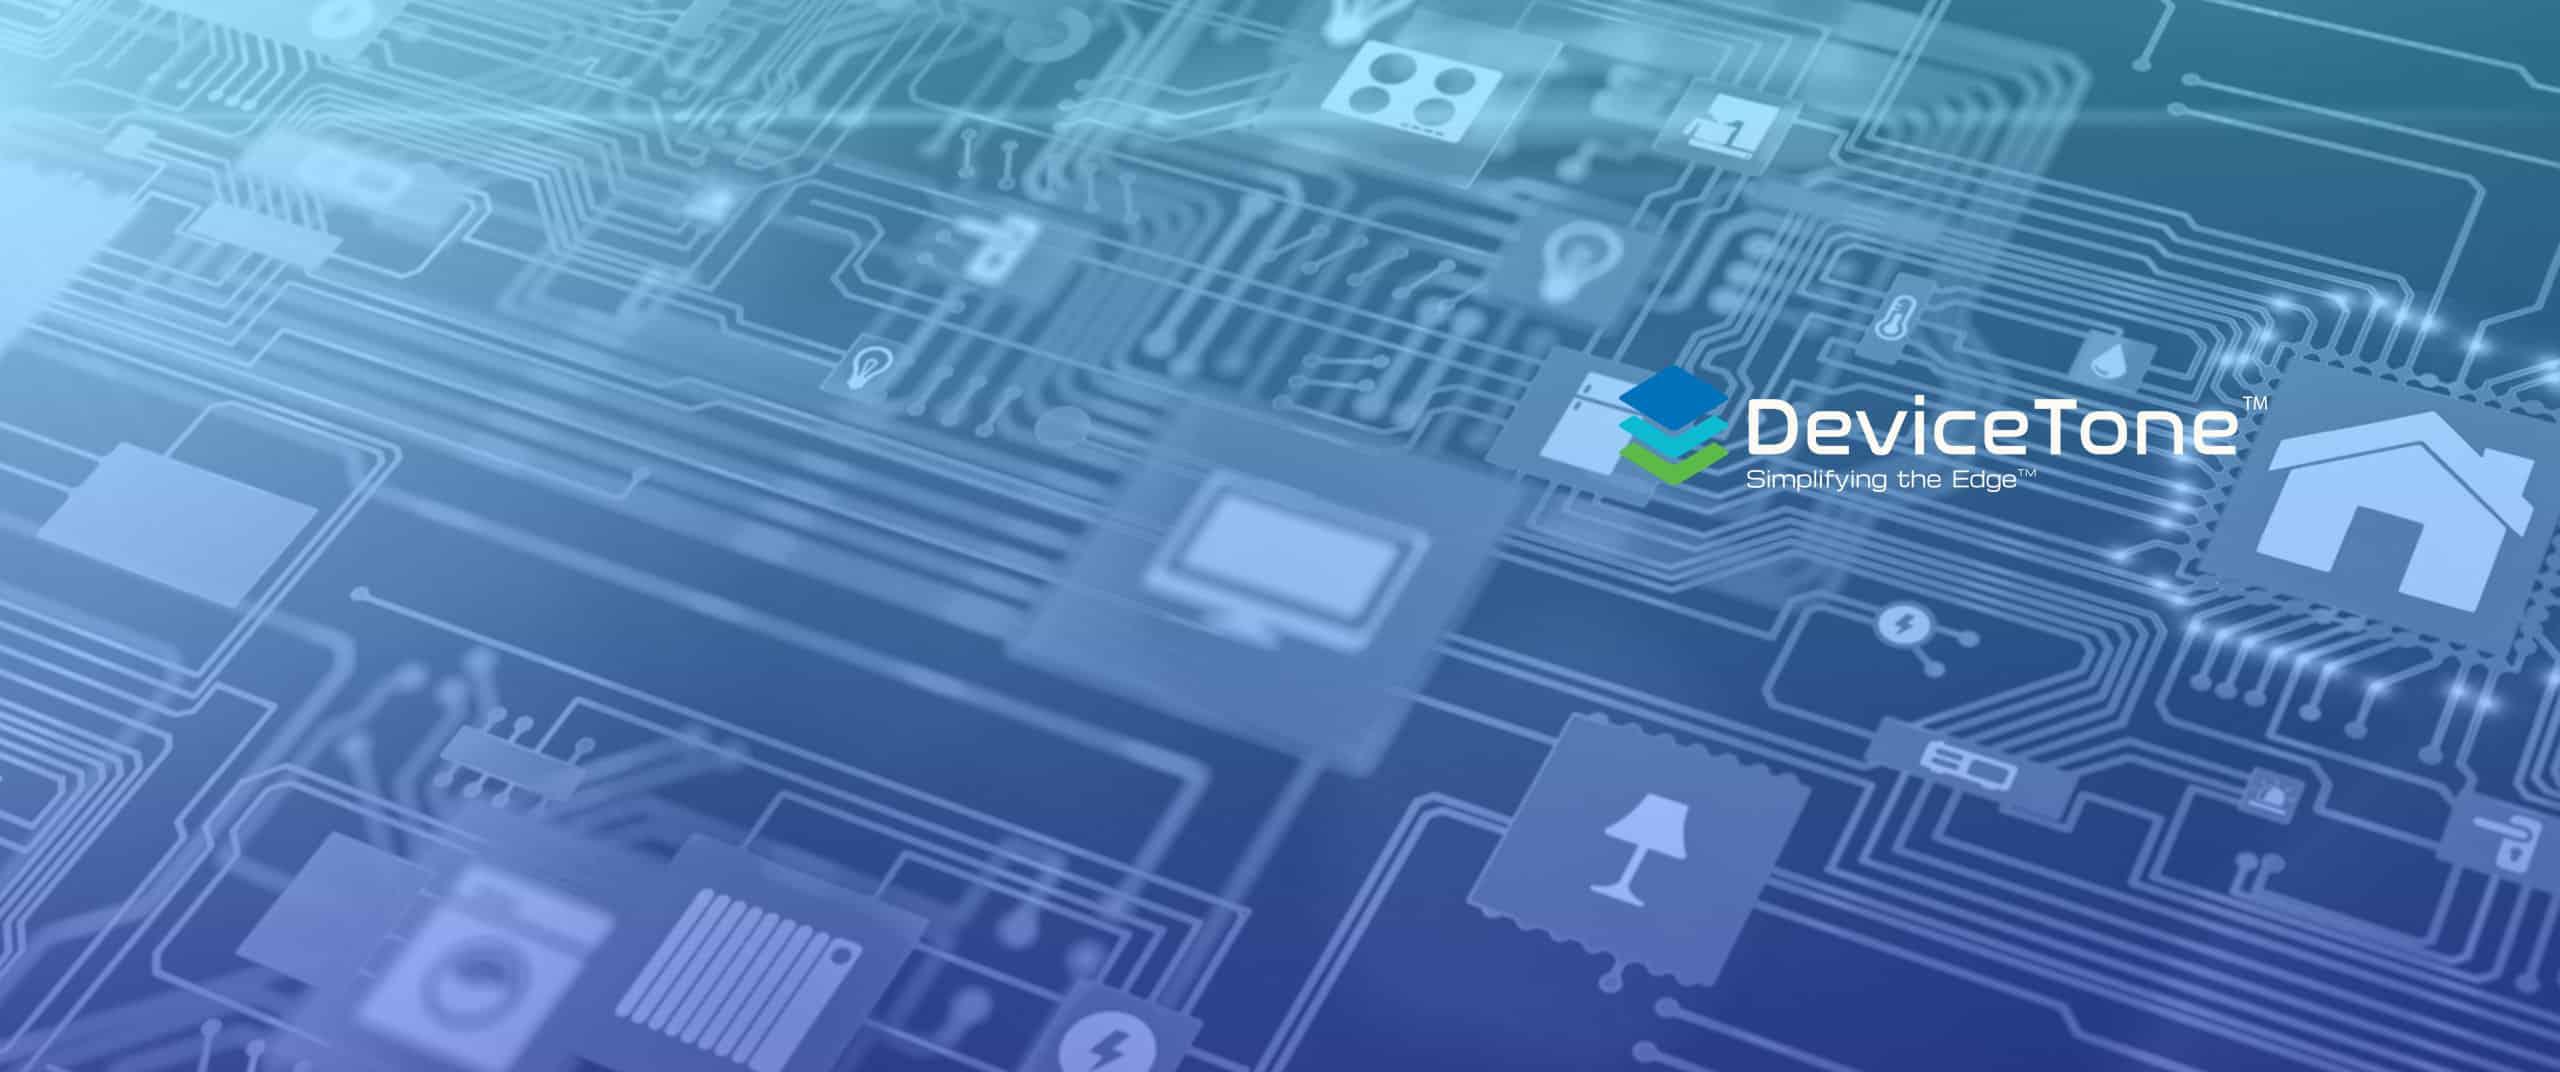 DeviceTone header